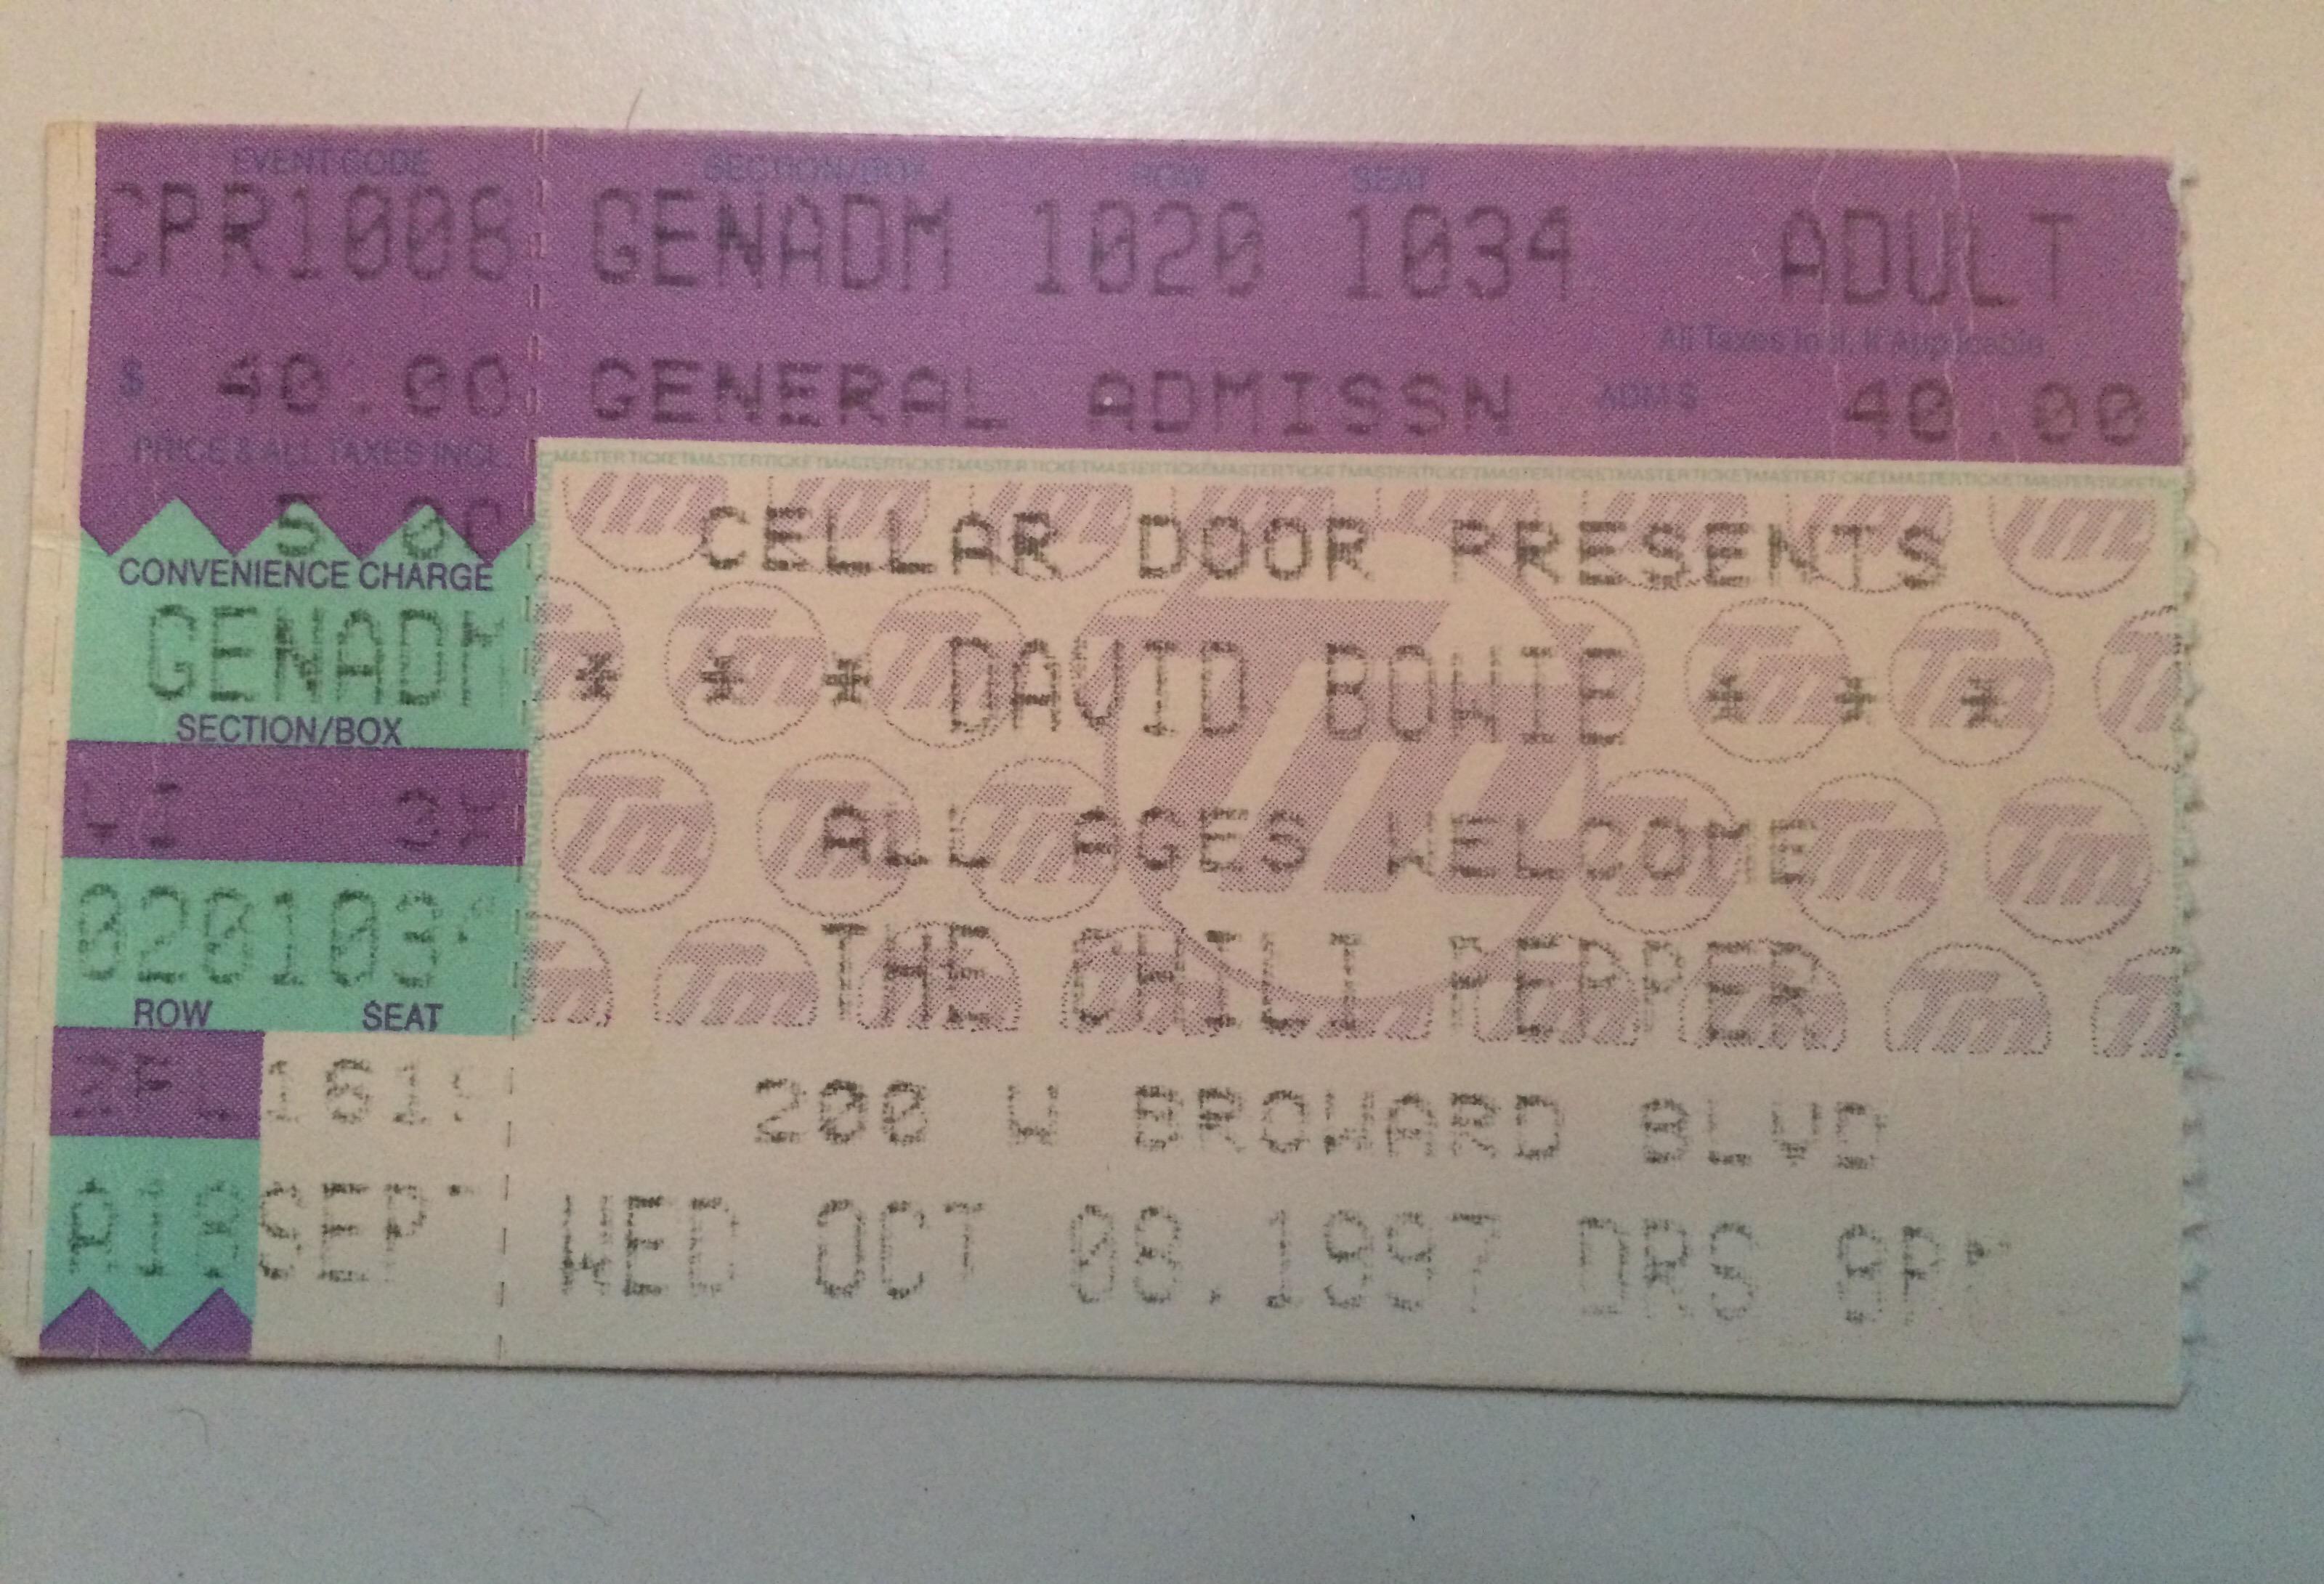 David Bowie Chili Pepper 10-7-97